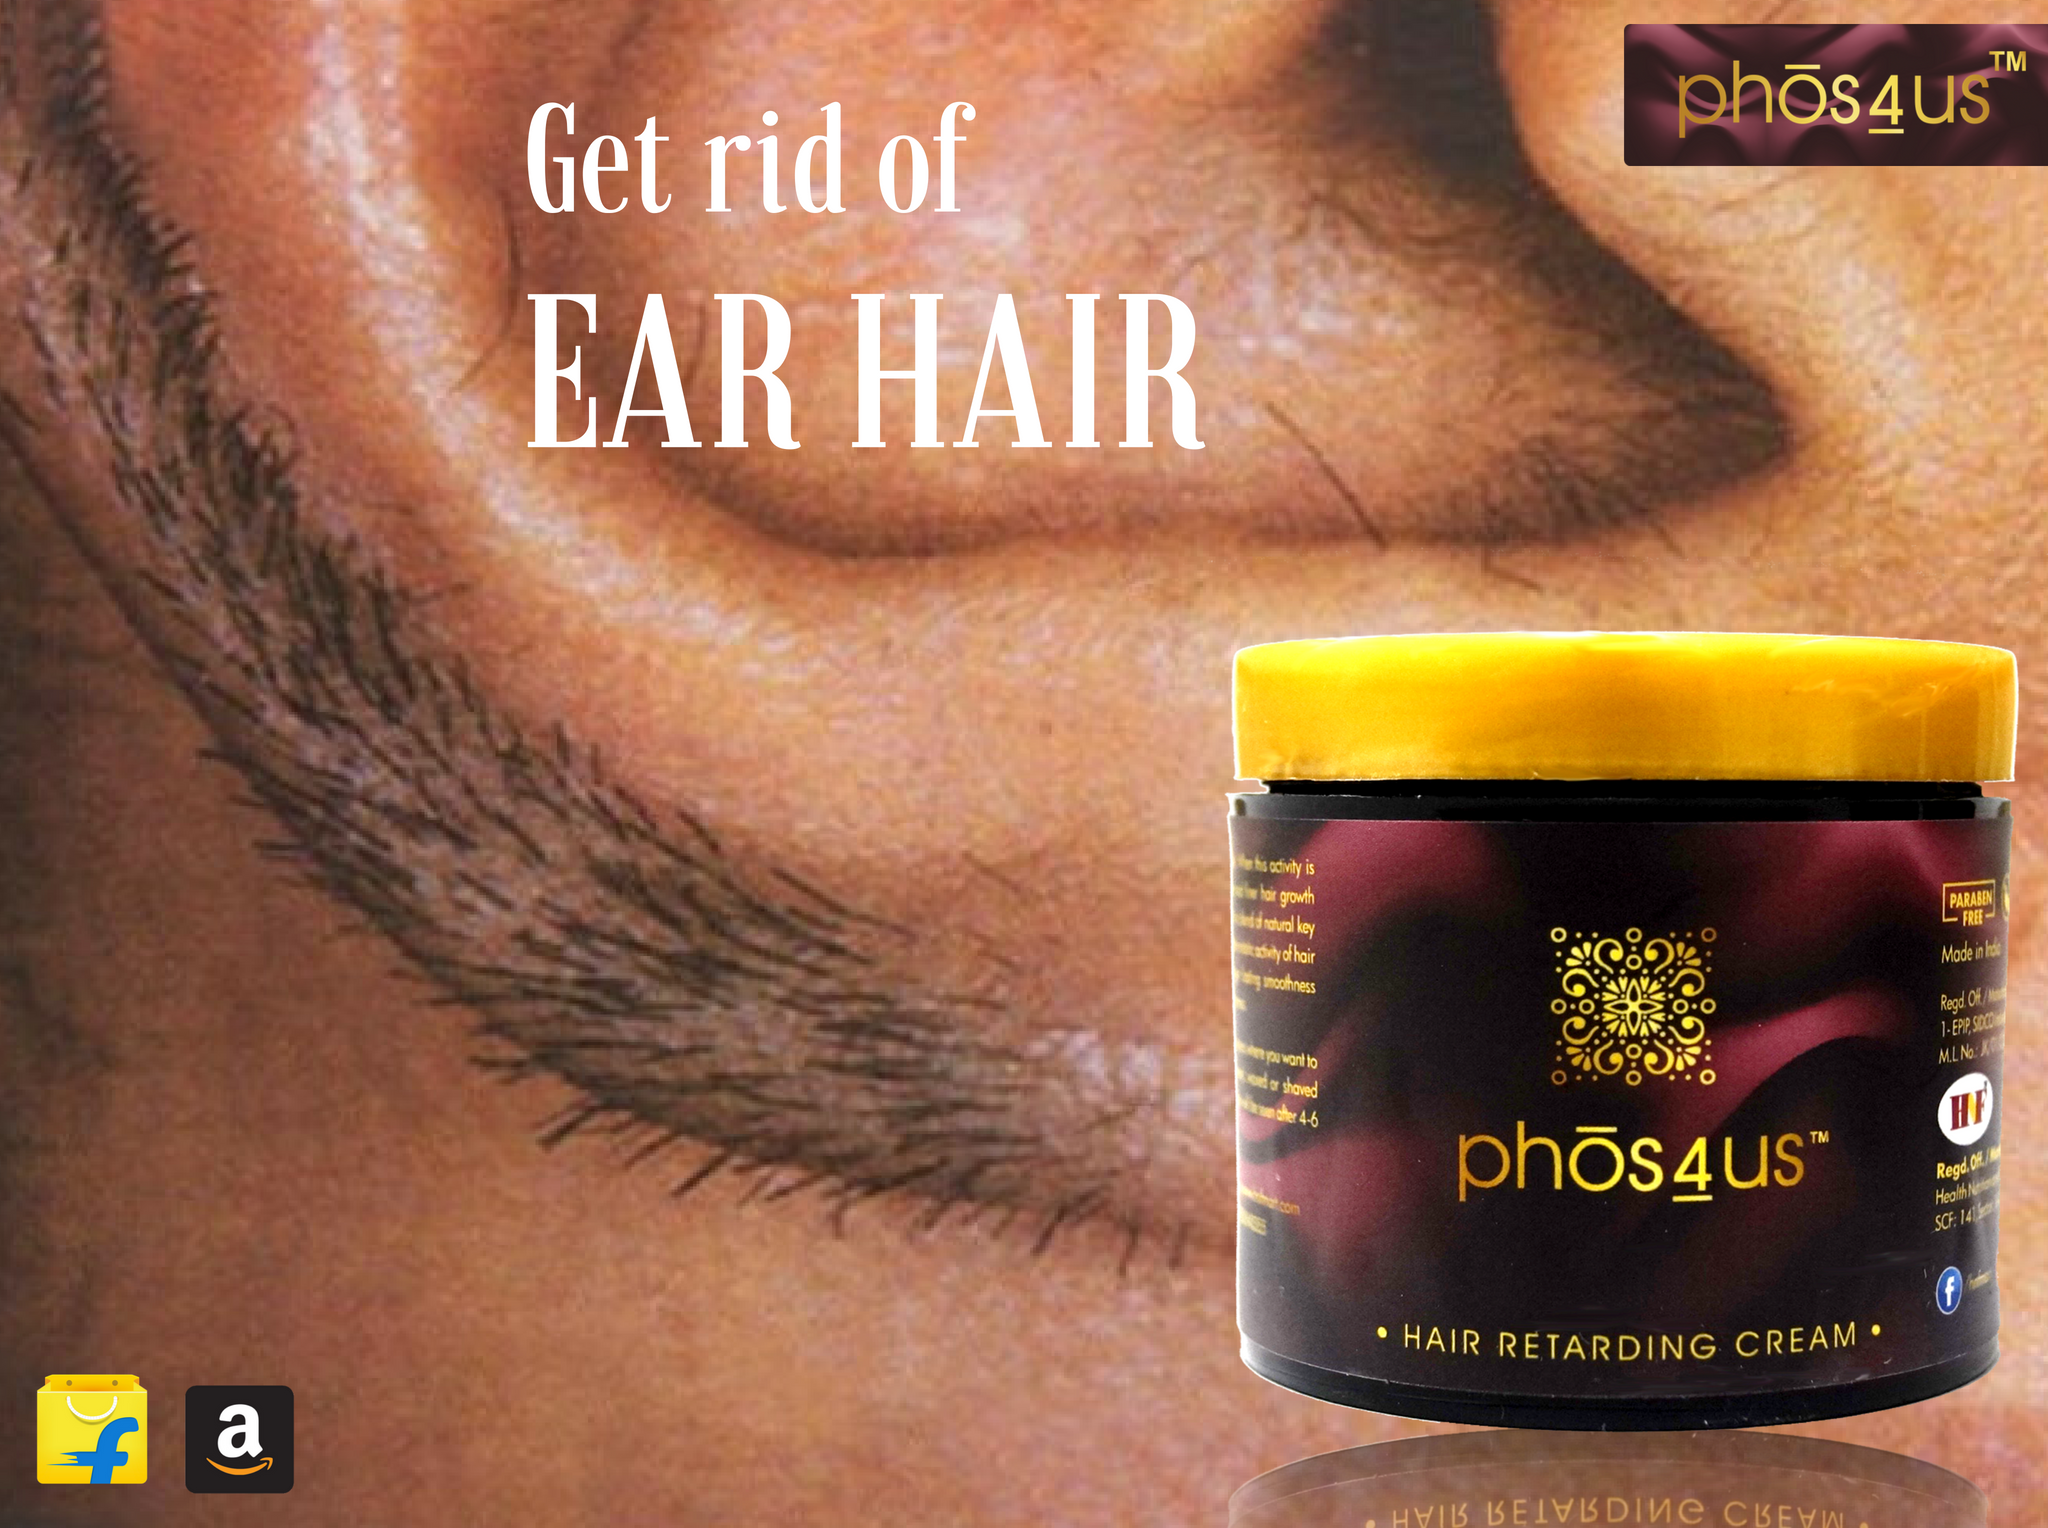 Get rid of Ear hair with #phos4us hair retarding cream and ...